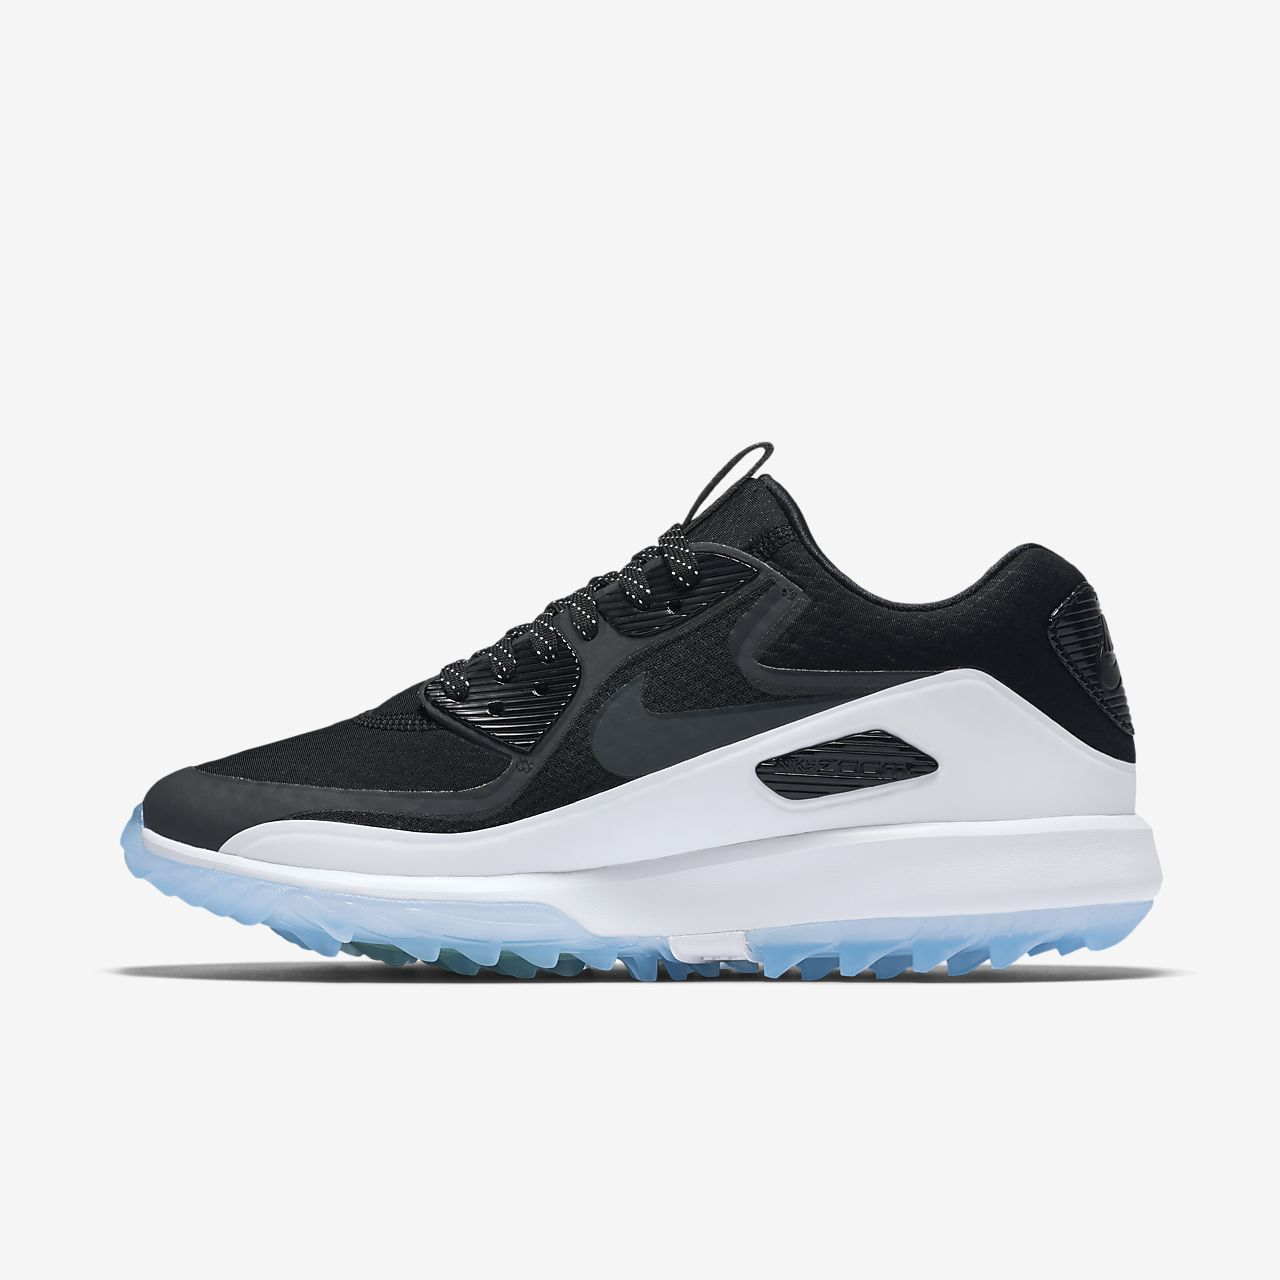 8e7fd134b0b Nike Air Zoom 90 IT Women s Golf Shoe. Nike.com CA